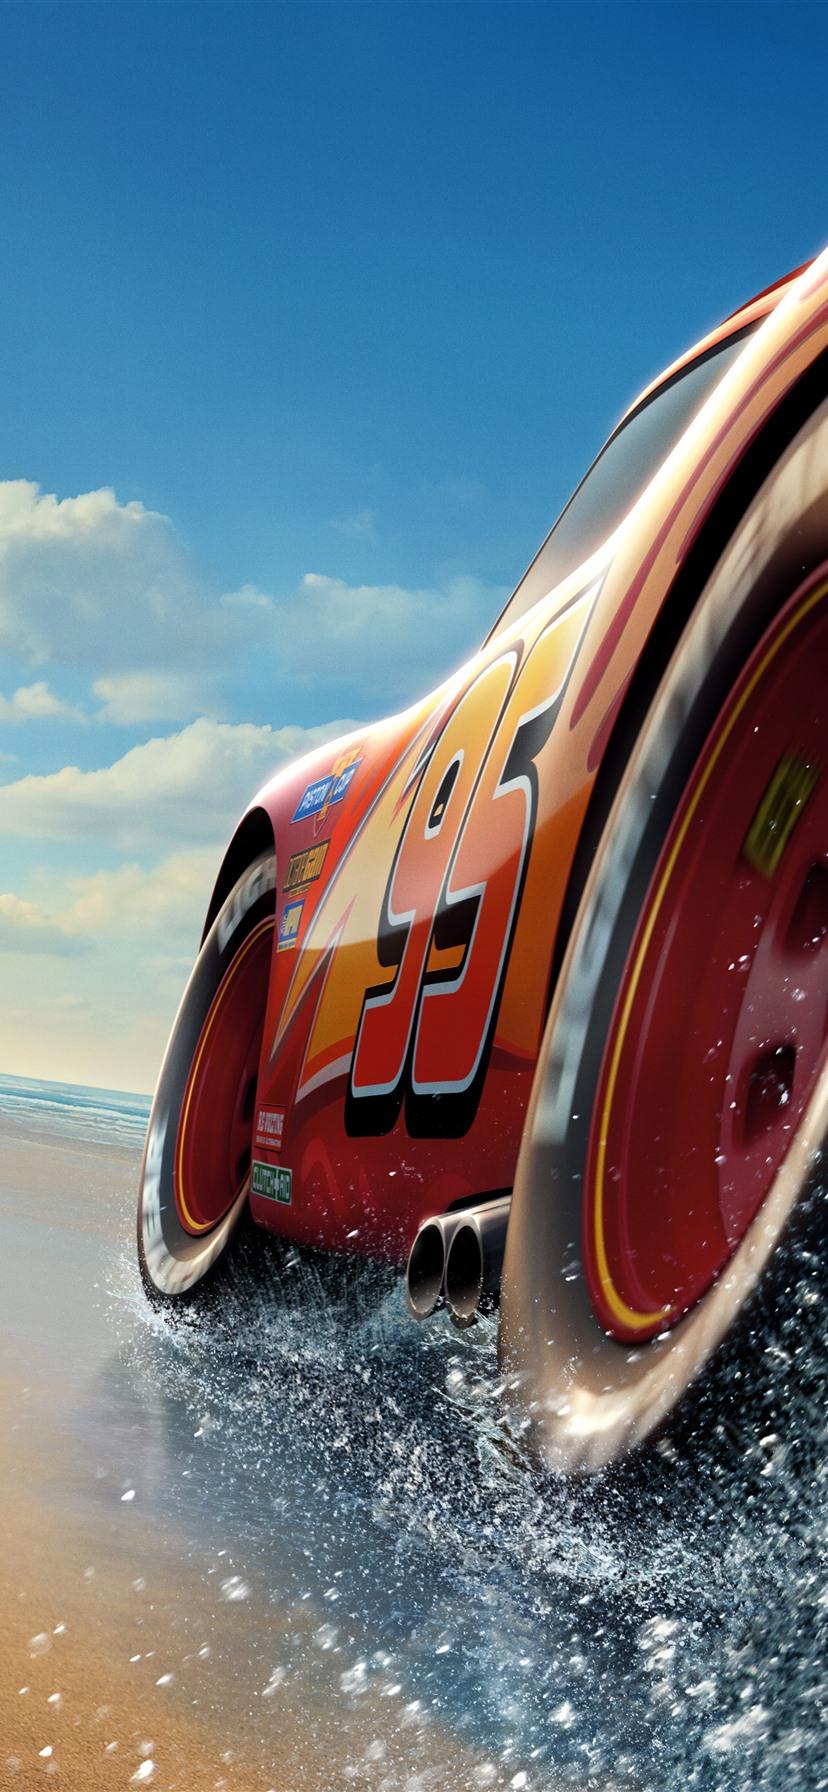 Wallpaper Cars 3 Lightning Mcqueen Beach Sea 7680x4320 Uhd 8k